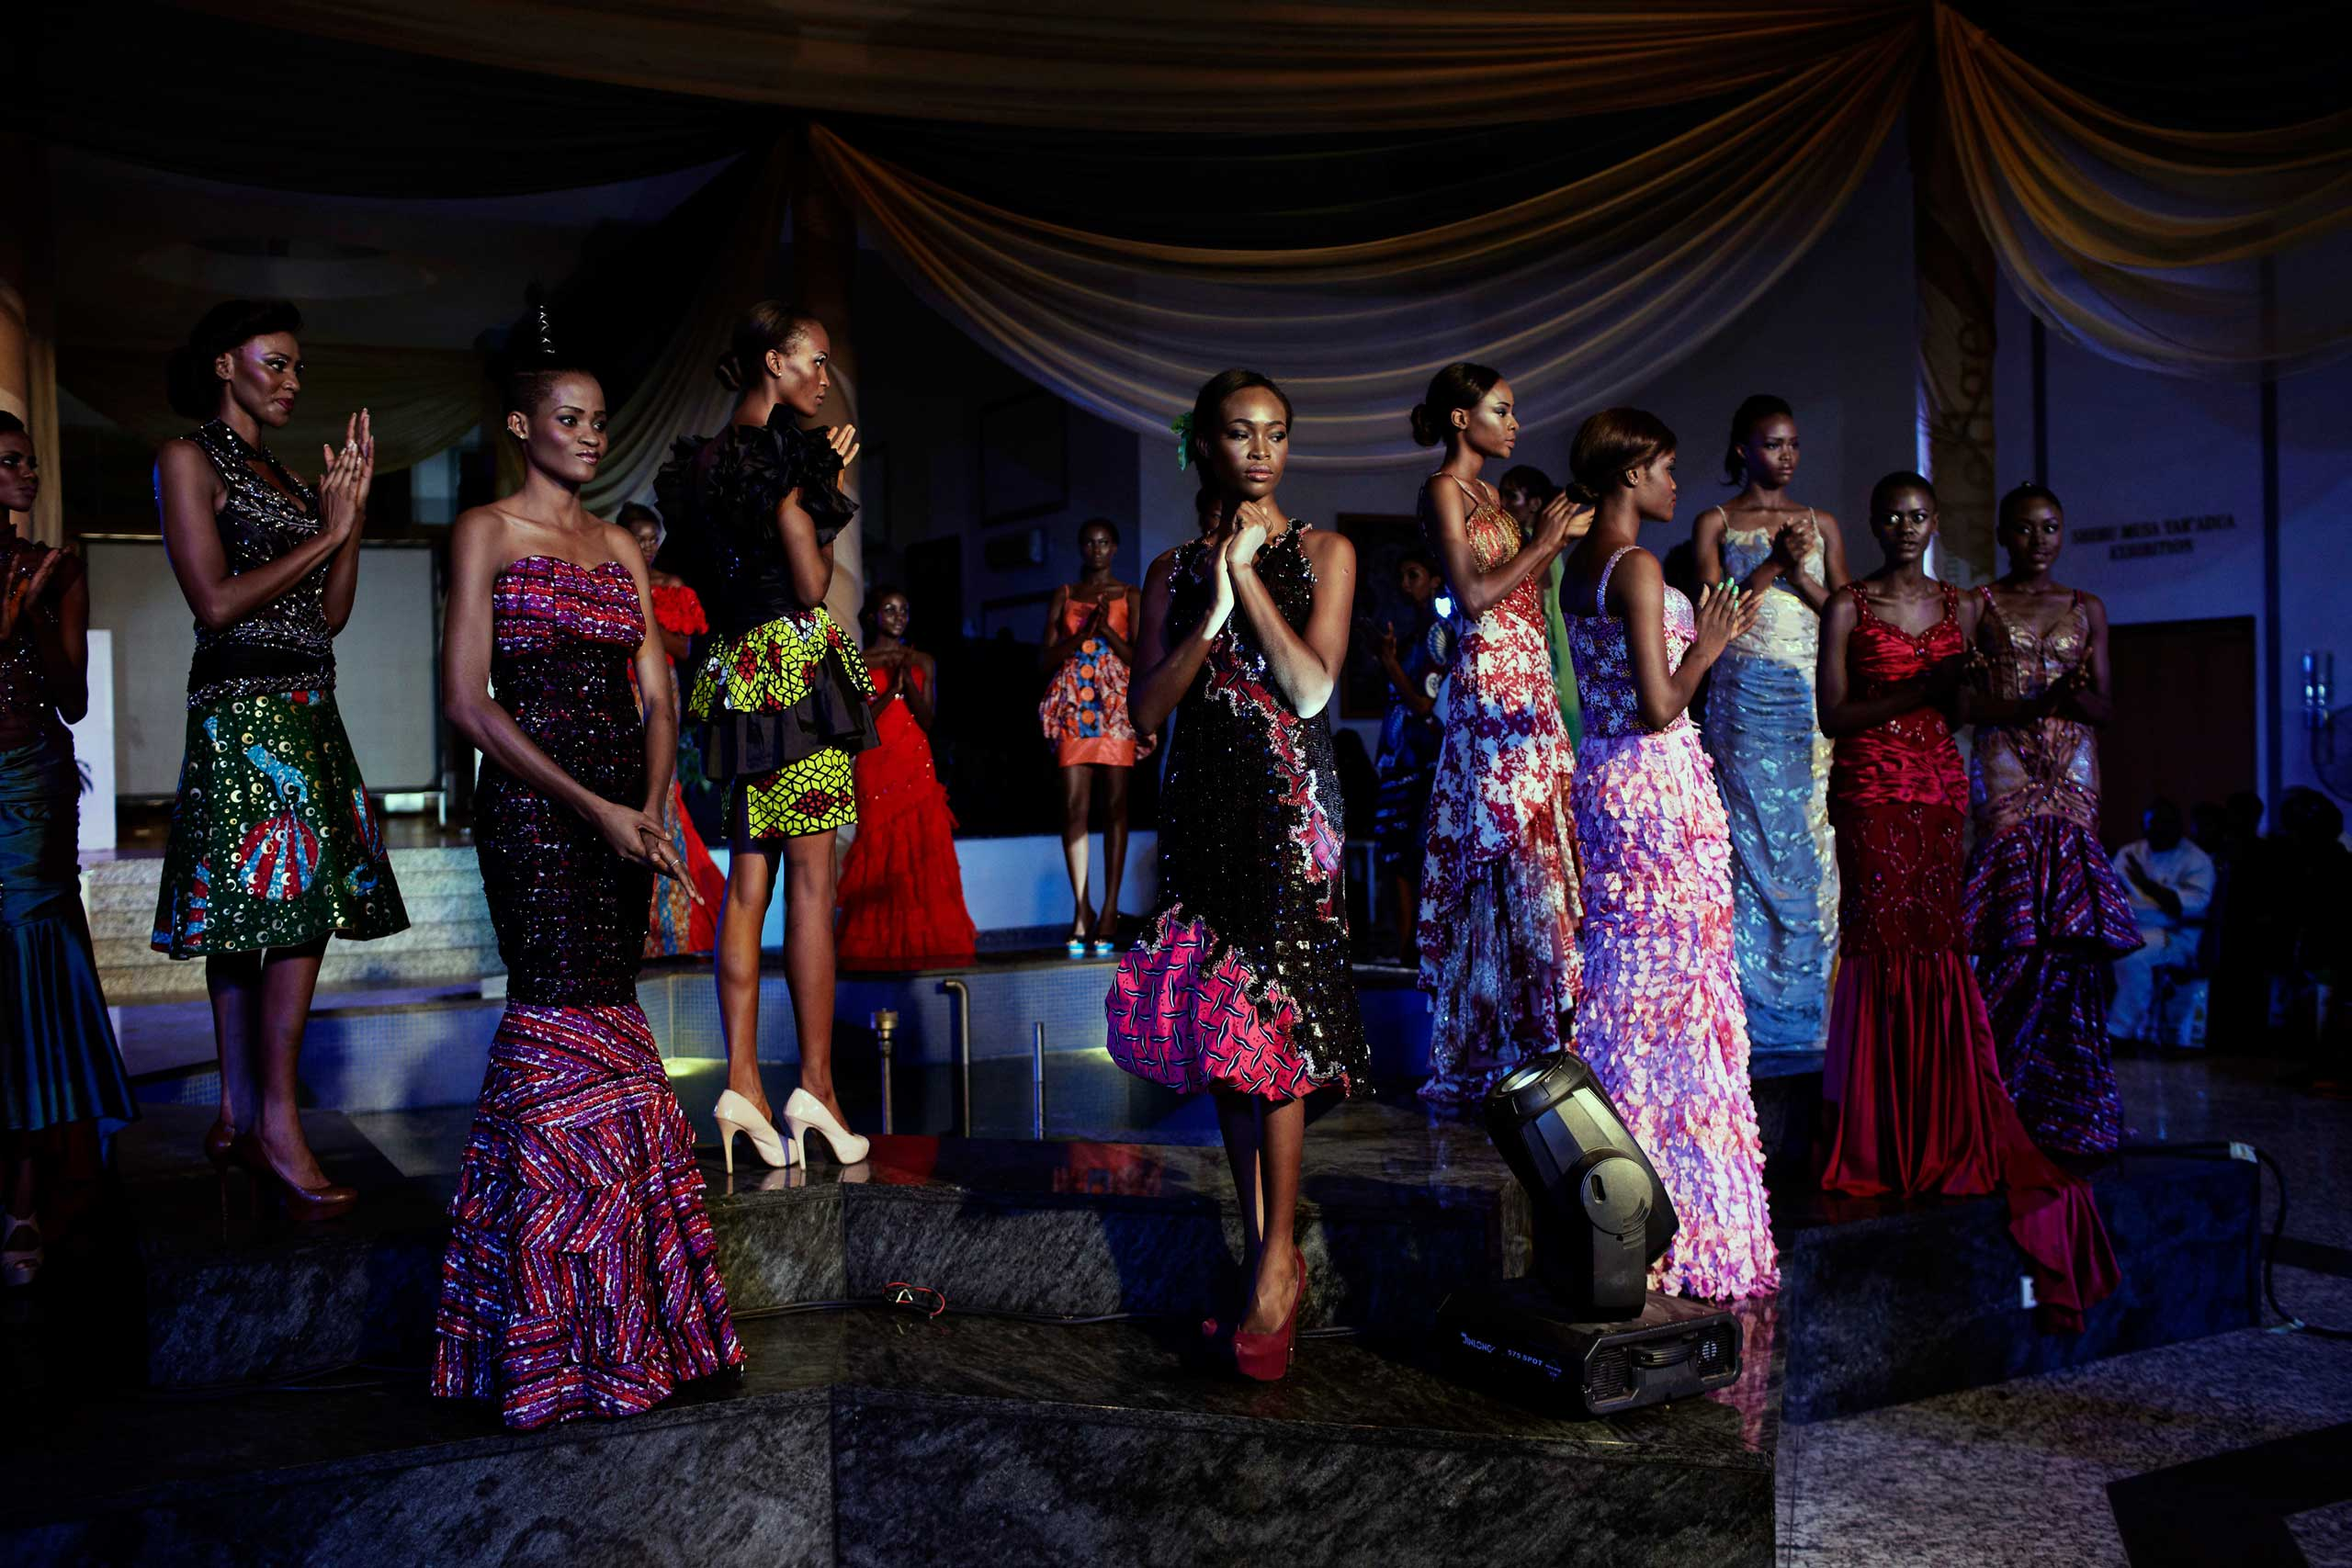 Models walk during a fashion show launching ECOWAS fashion week on May 26, 2013 in Abuja, Nigeria.